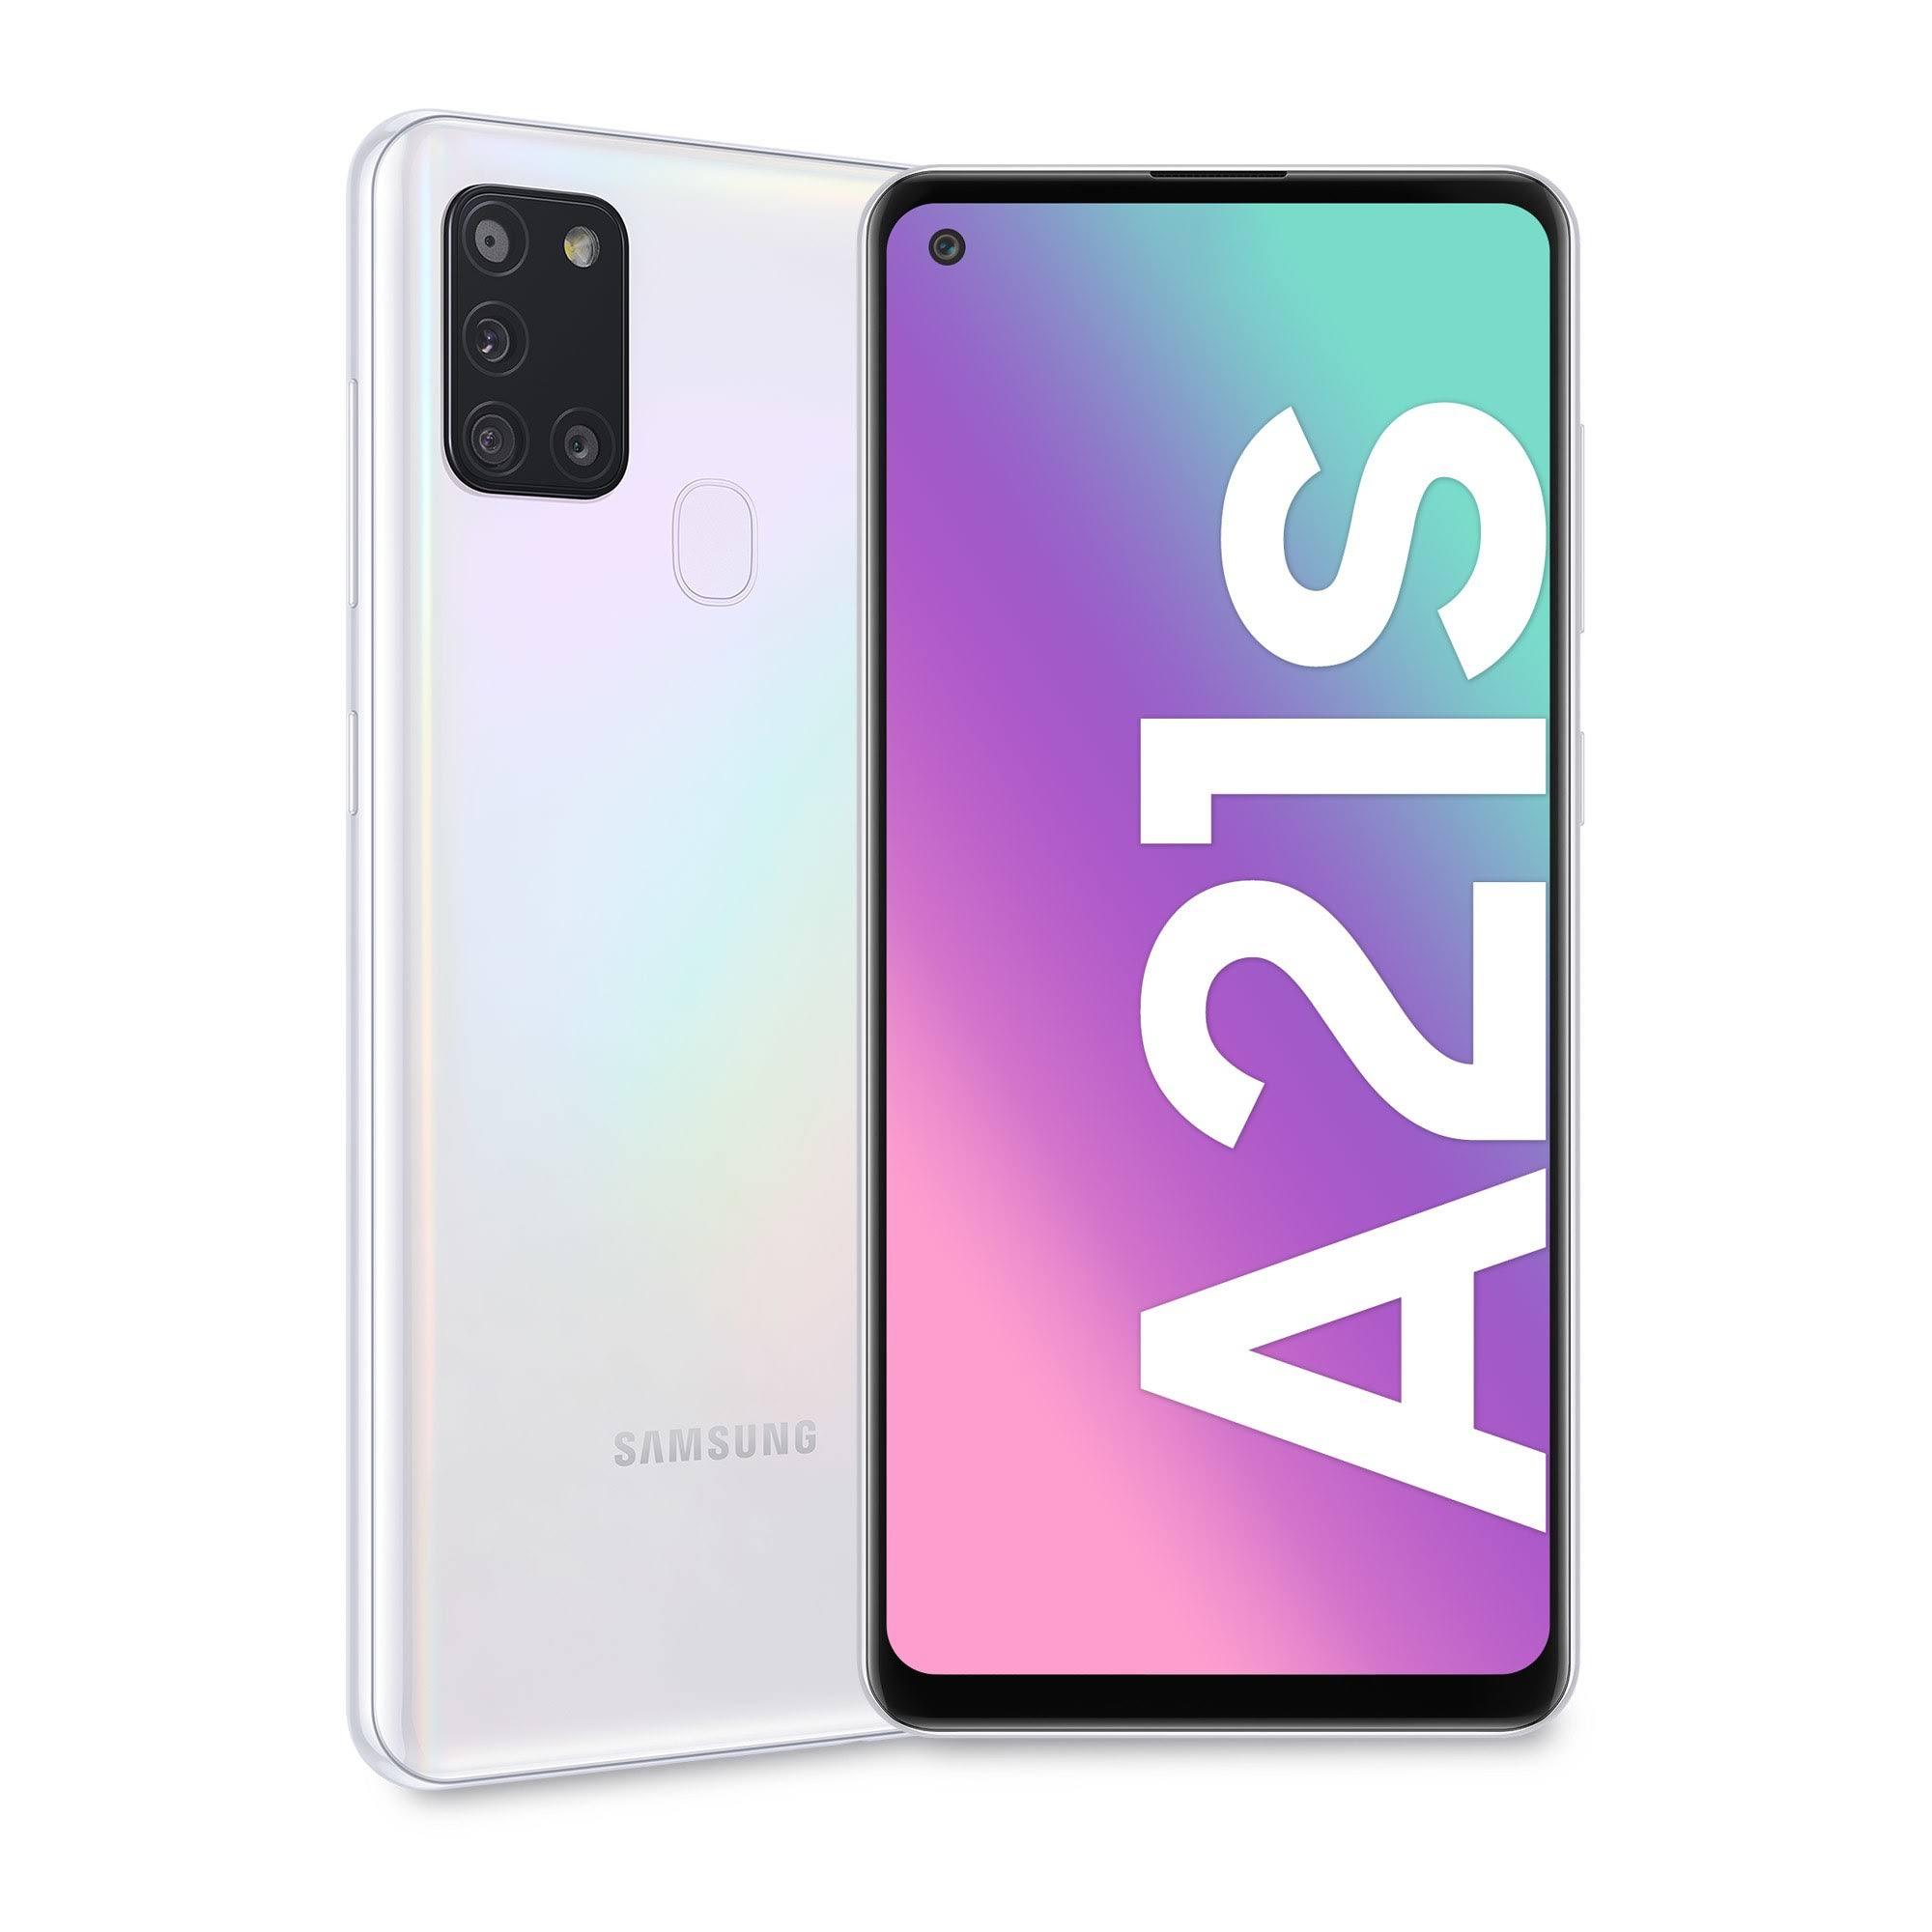 Samsung Galaxy A21s Dual SIM White 32GB and 3GB RAM (SM-A217F/DS)